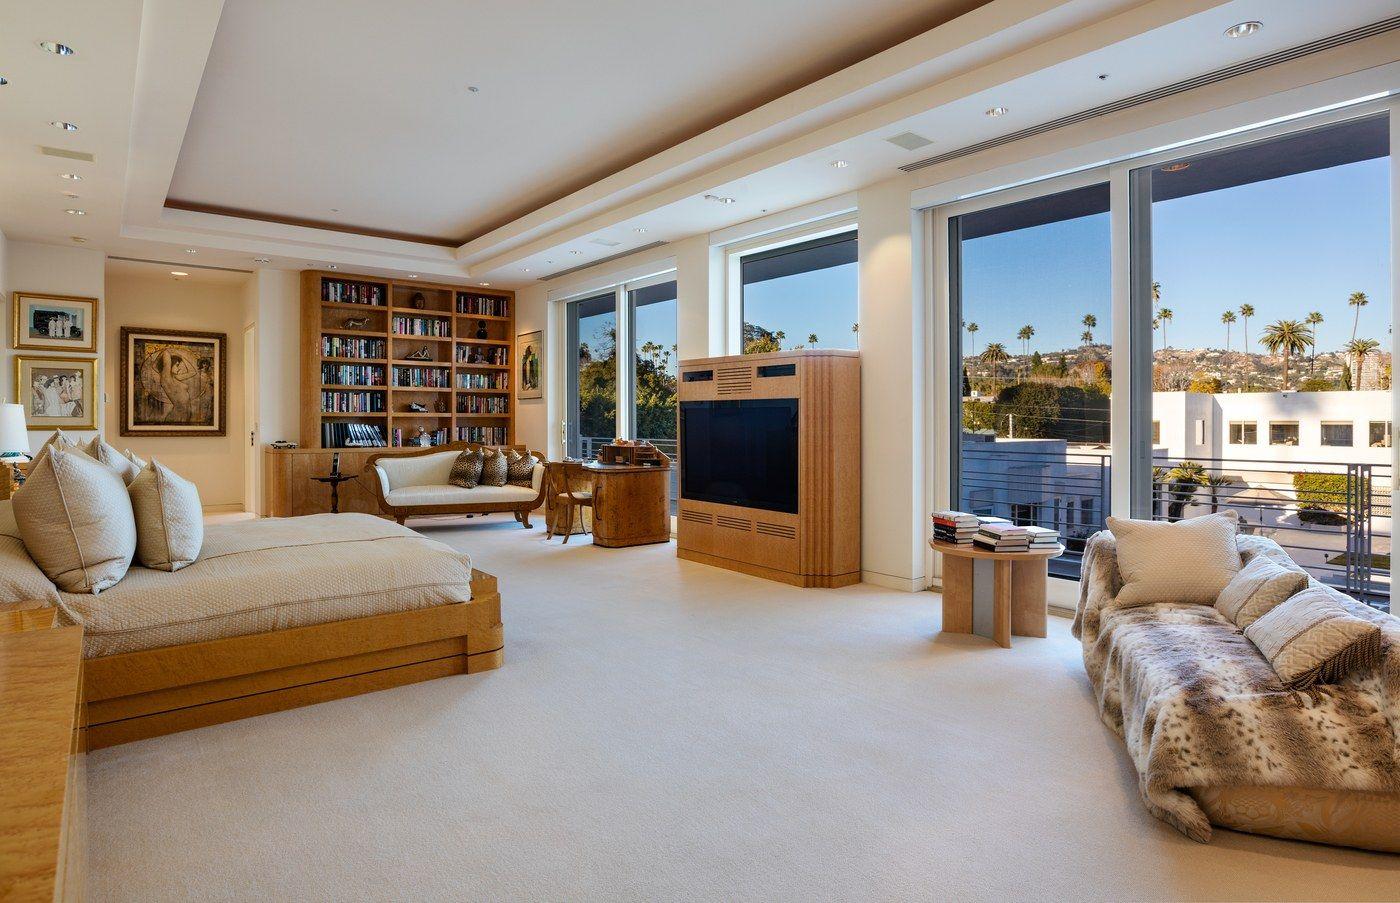 150 Stunning Celebrity Homes Celebrity houses, Modern